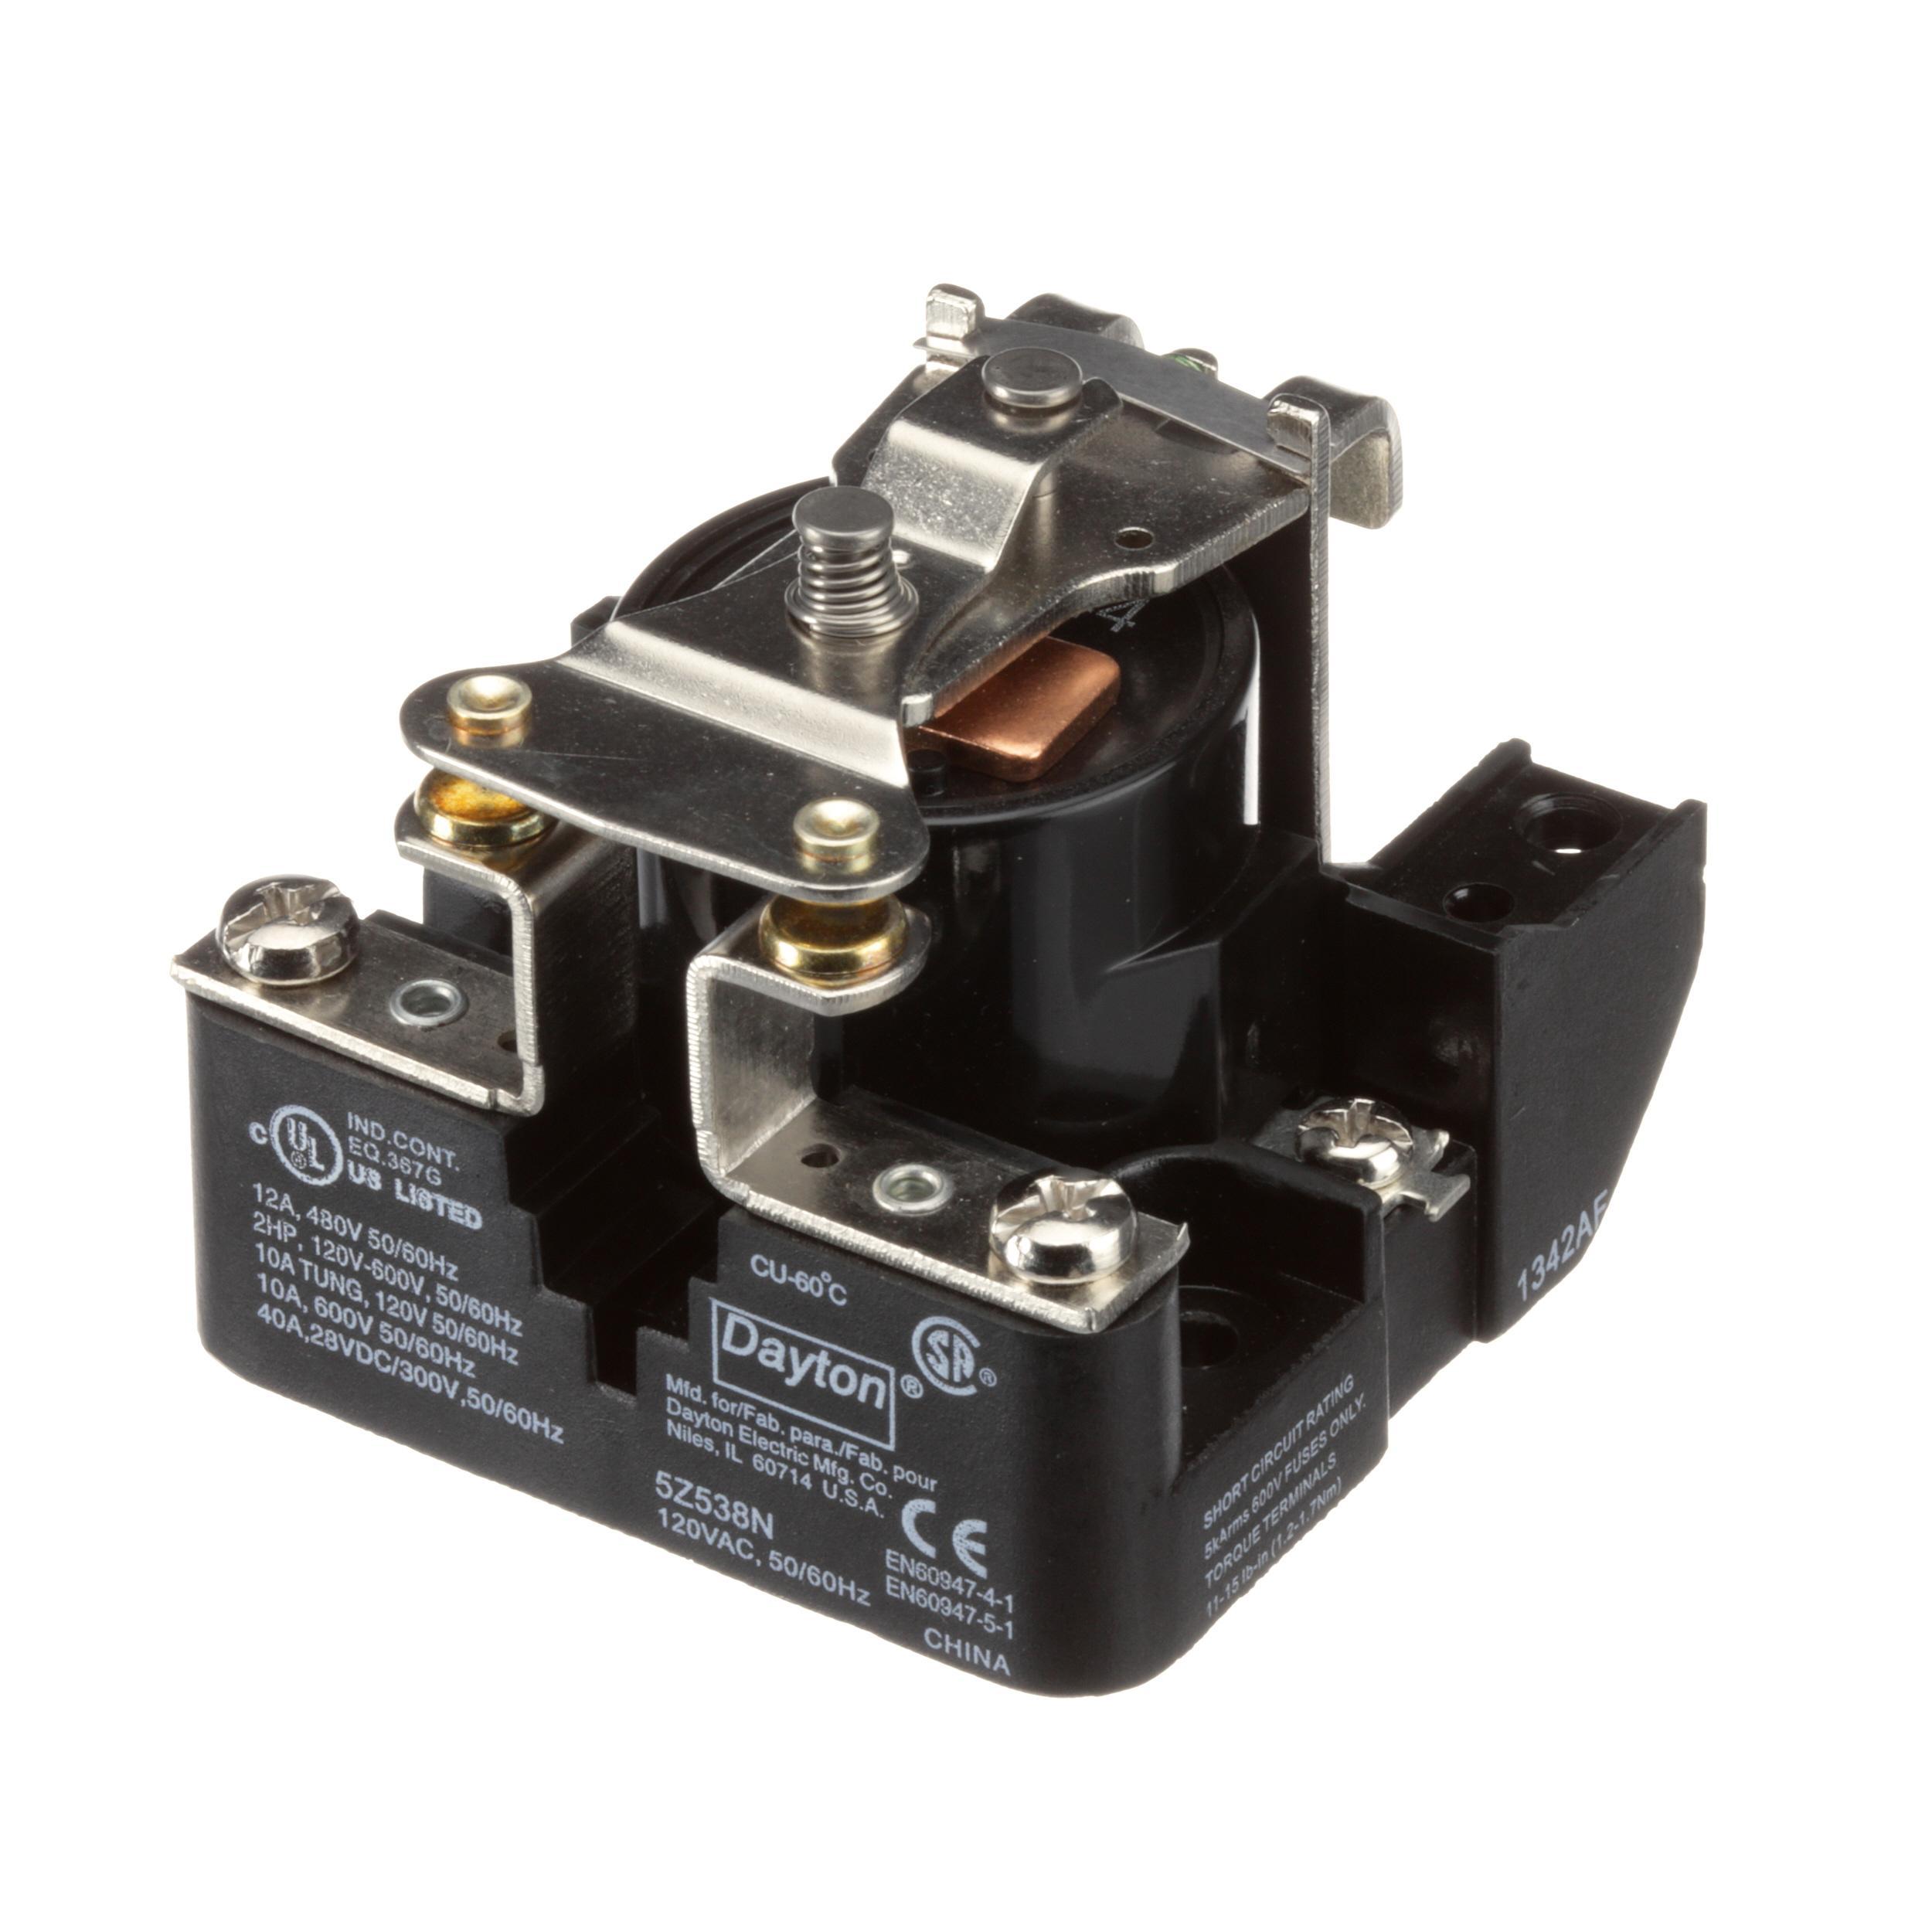 Centramatic Motor Relay Part 605d